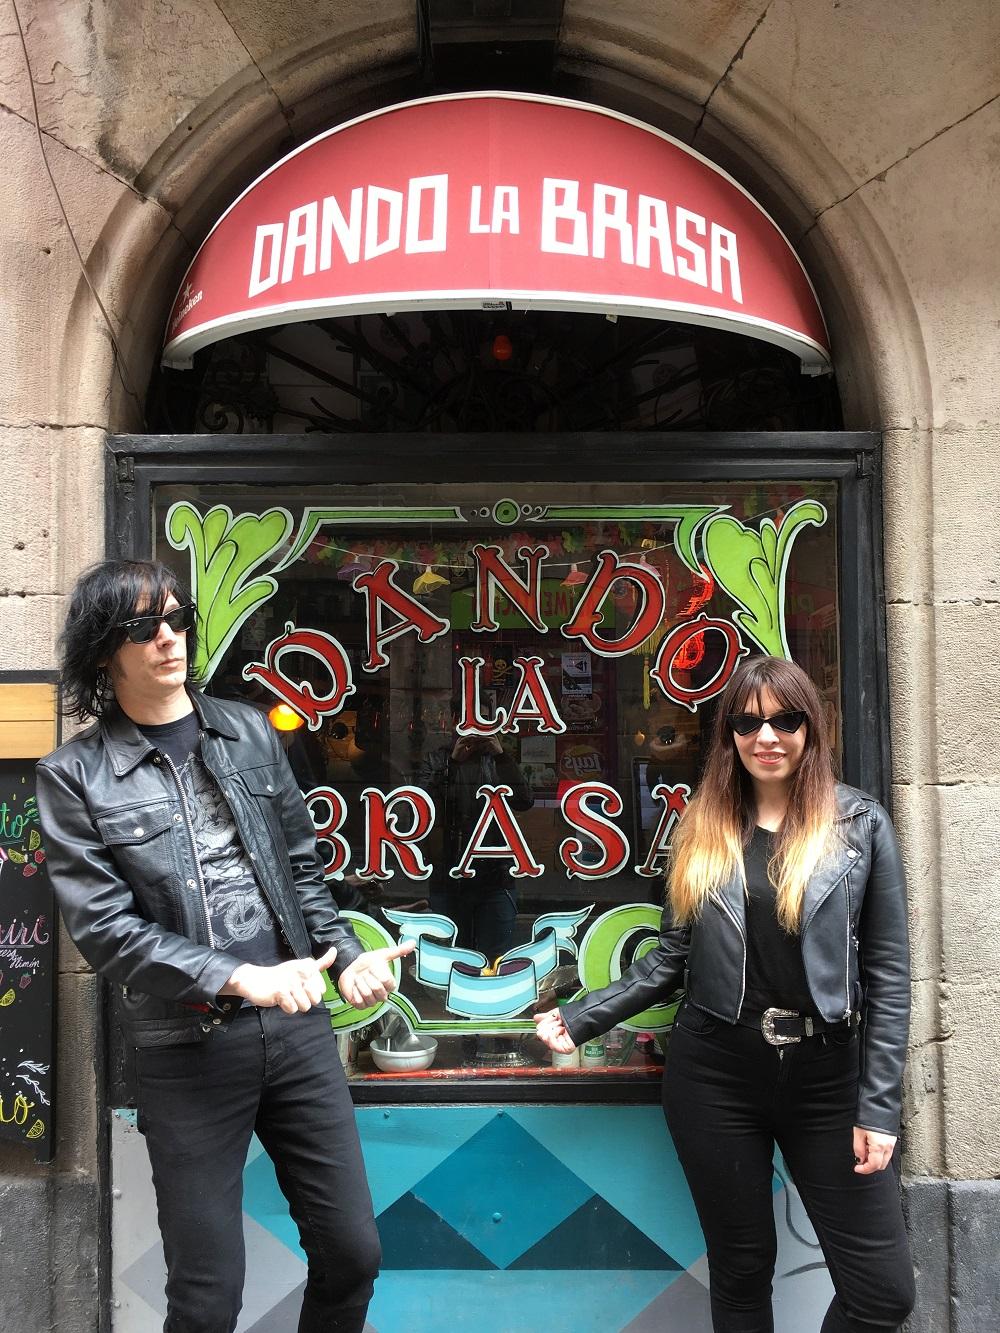 Capsula en Dando La Brasa (Bilbao)